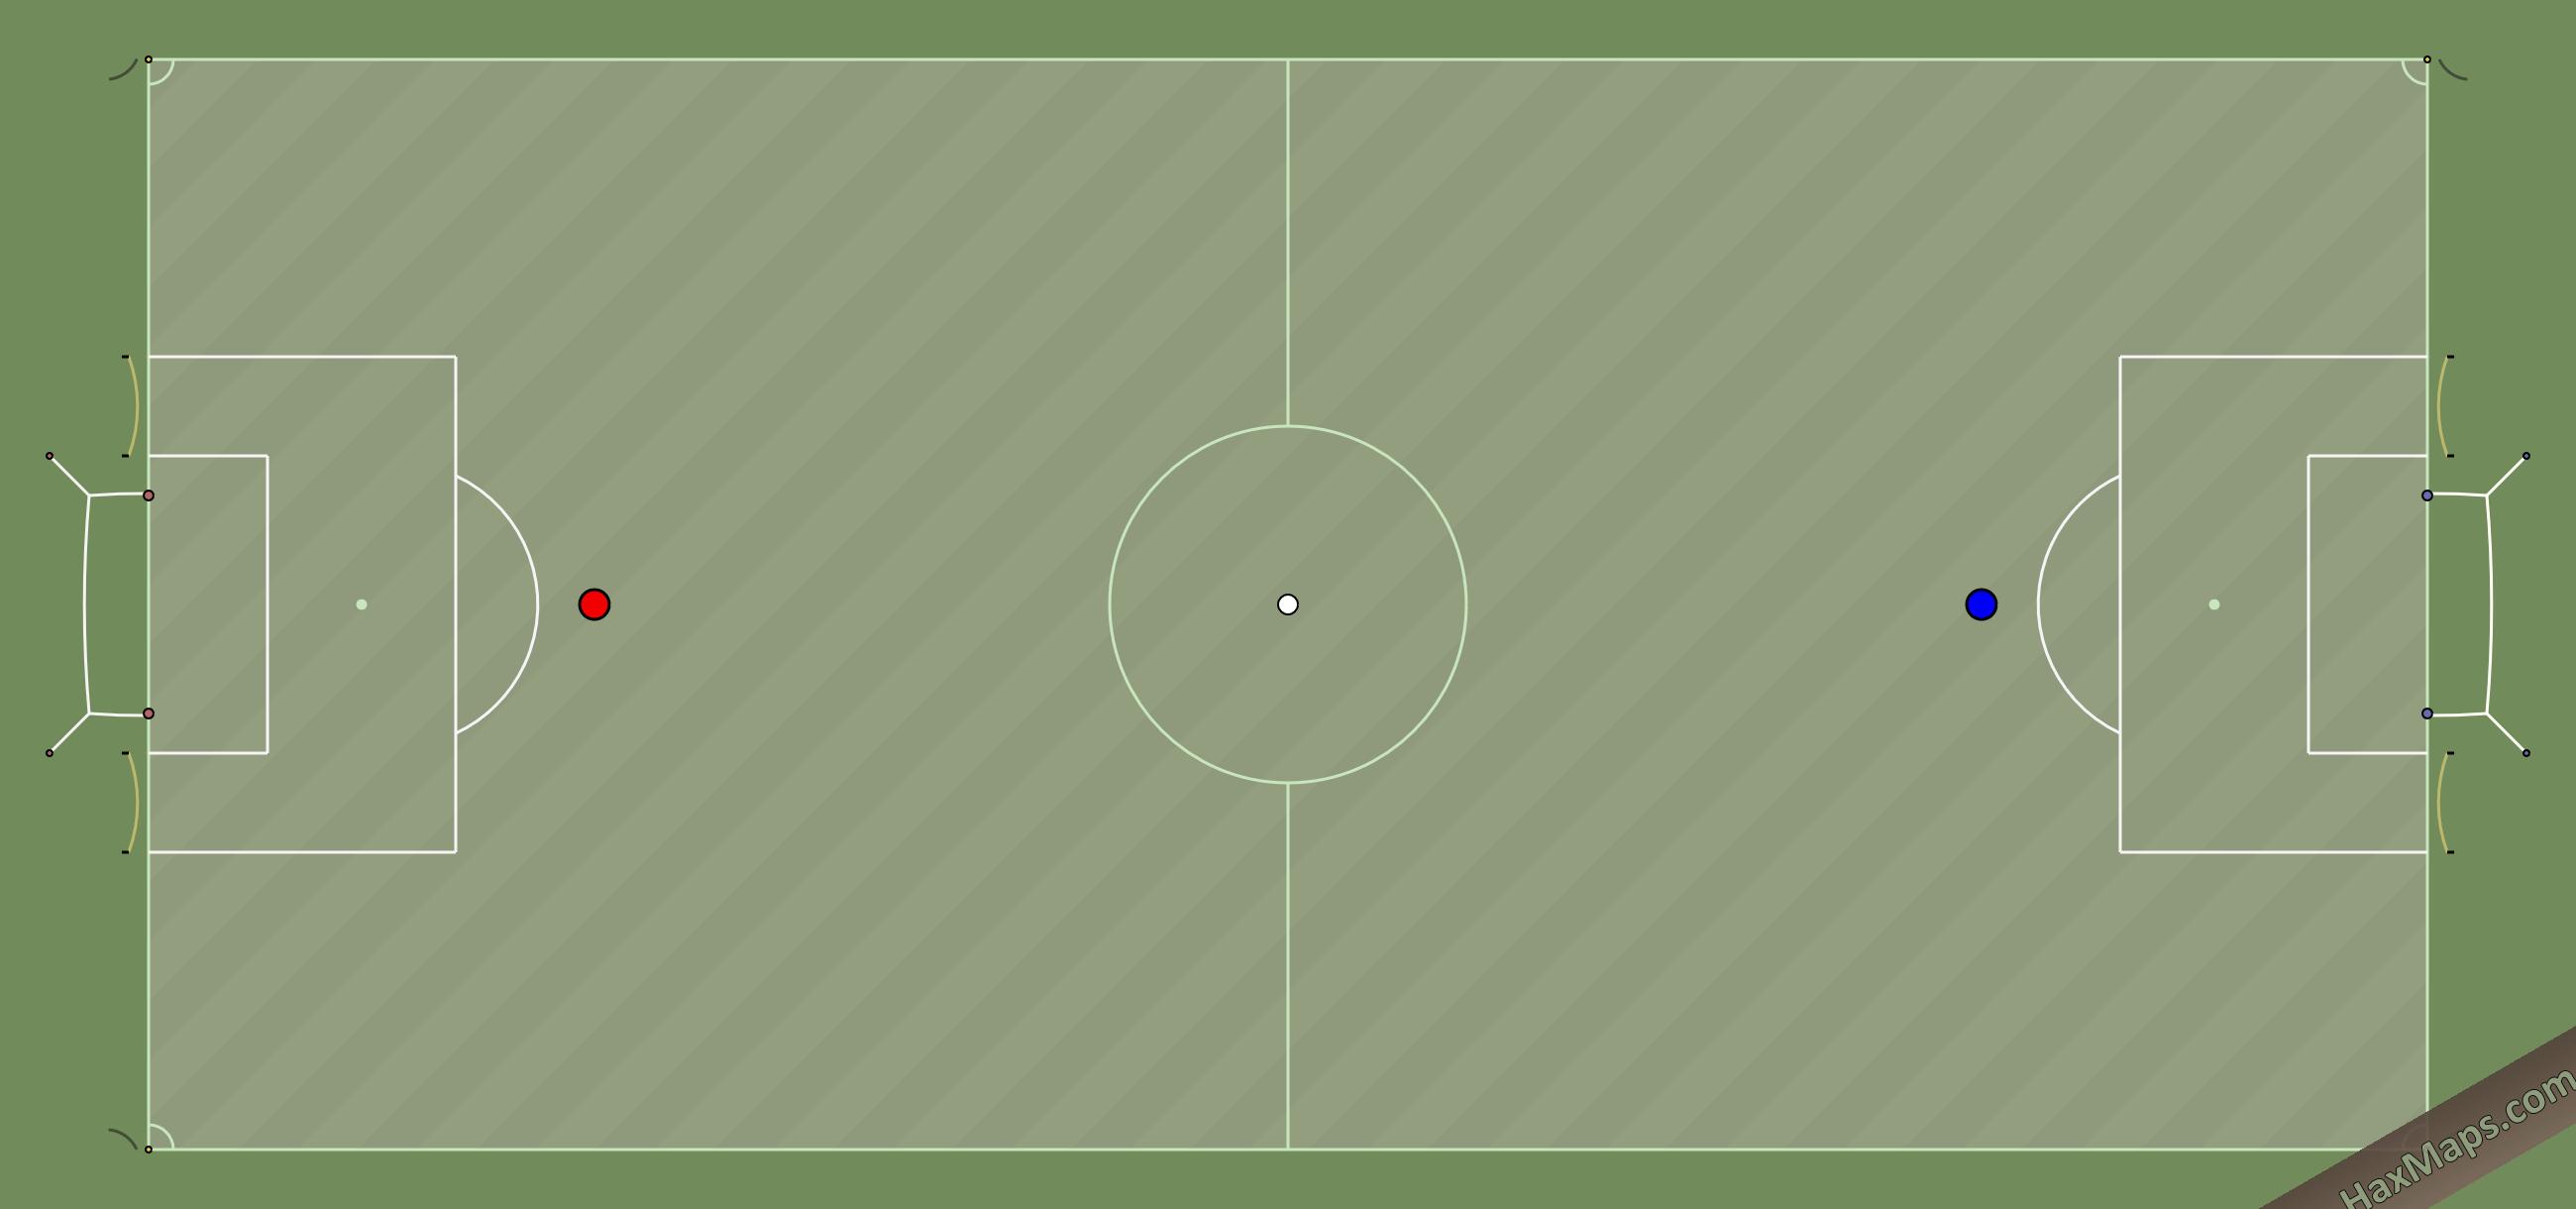 hax ball maps | Real Soccer V5 by HWN HaxBall White Night